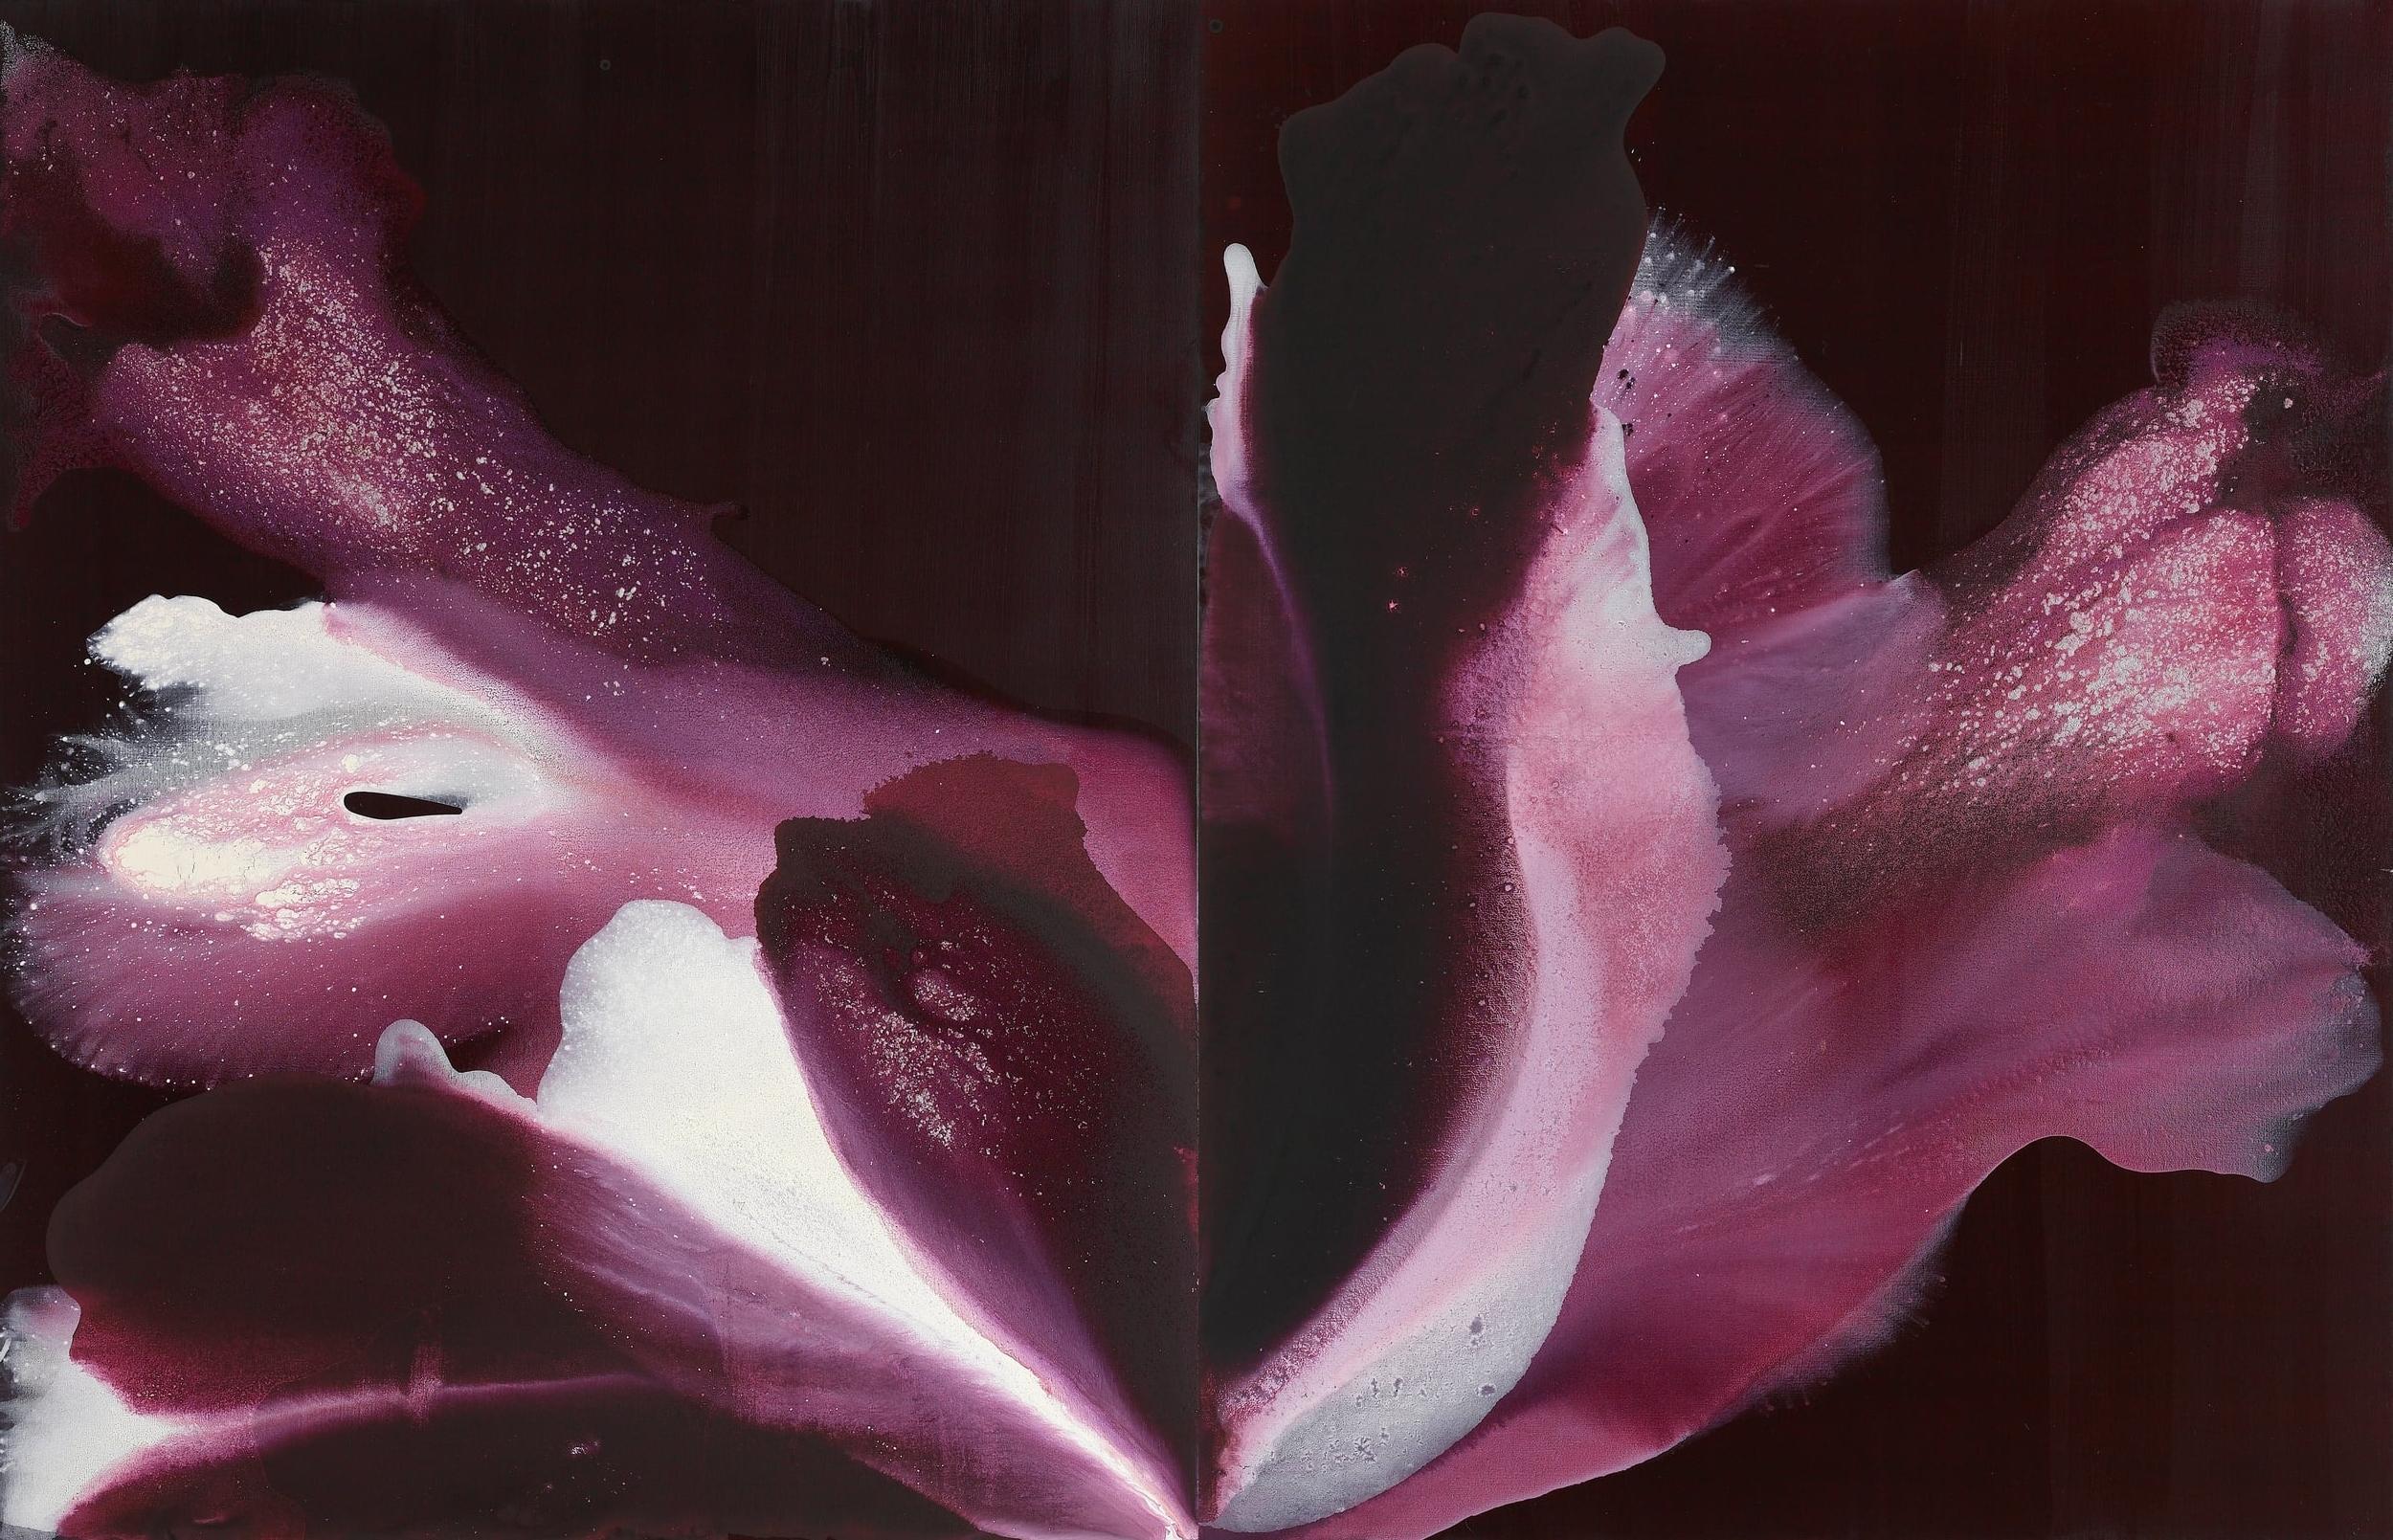 figure_15  acrylic and pumice  gel on canvas  130 cm X 162 cm  2013